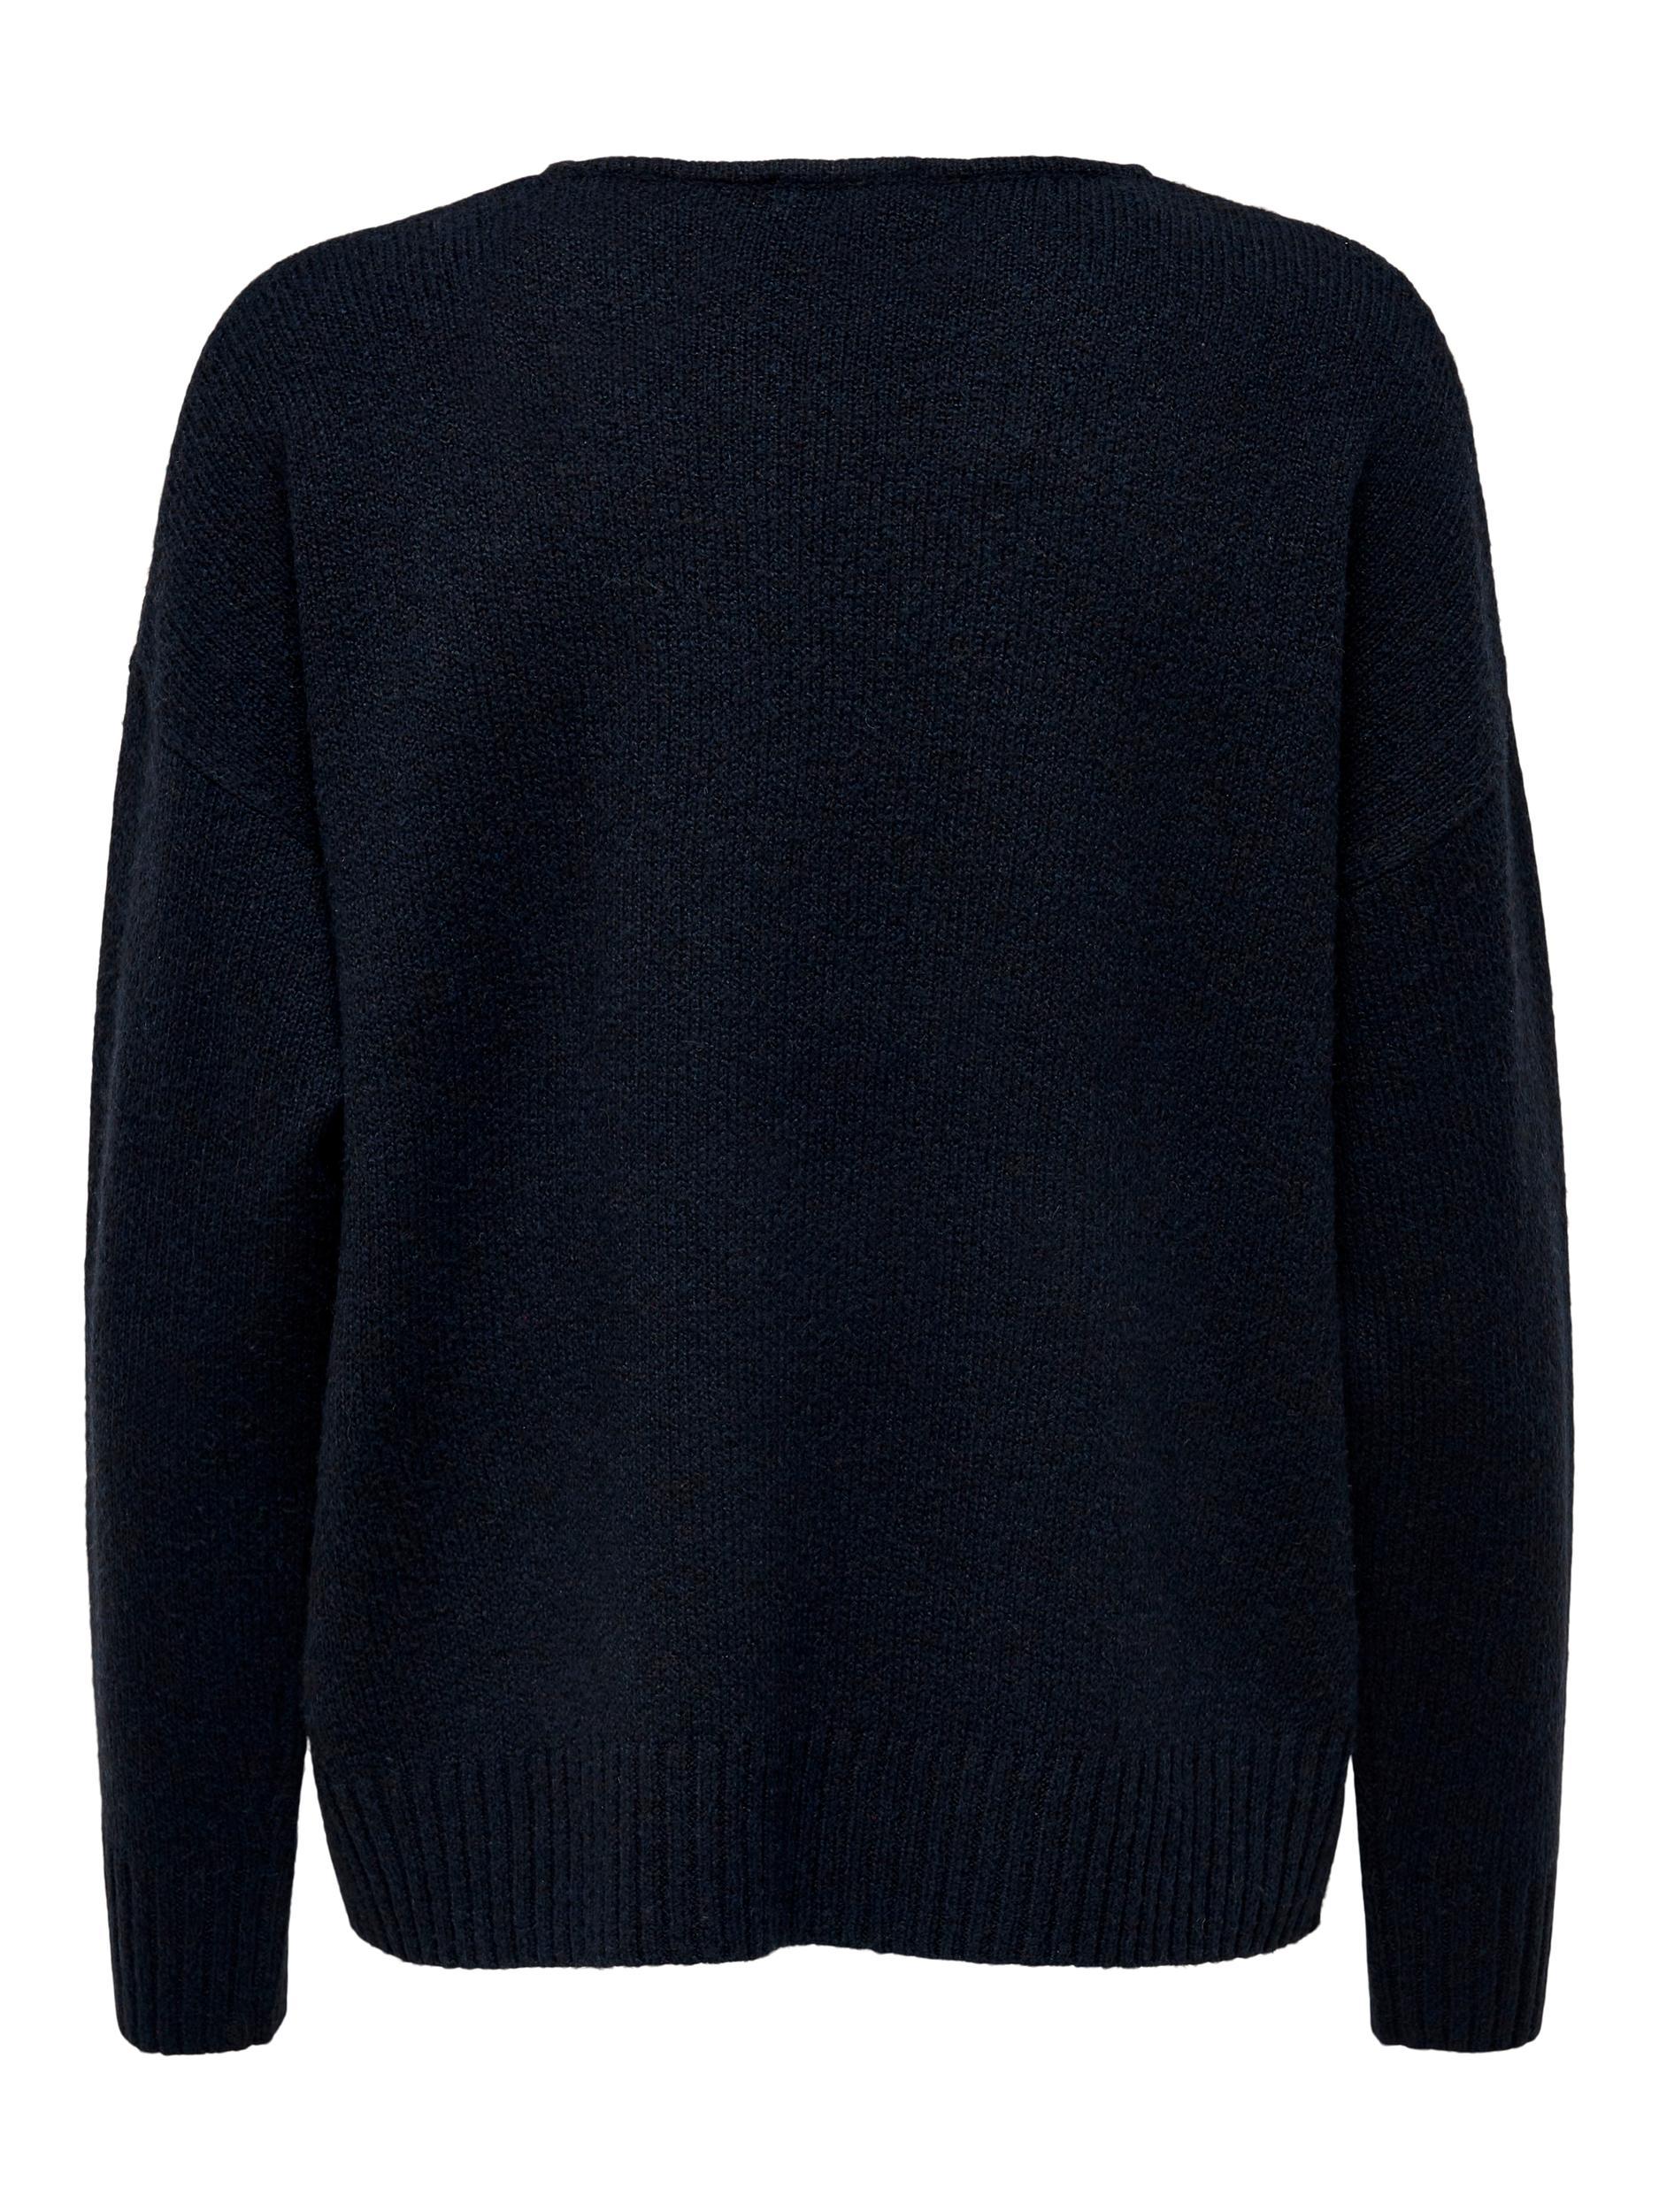 Jacqueline de Yong Gitta sweater, sky captain, x-small